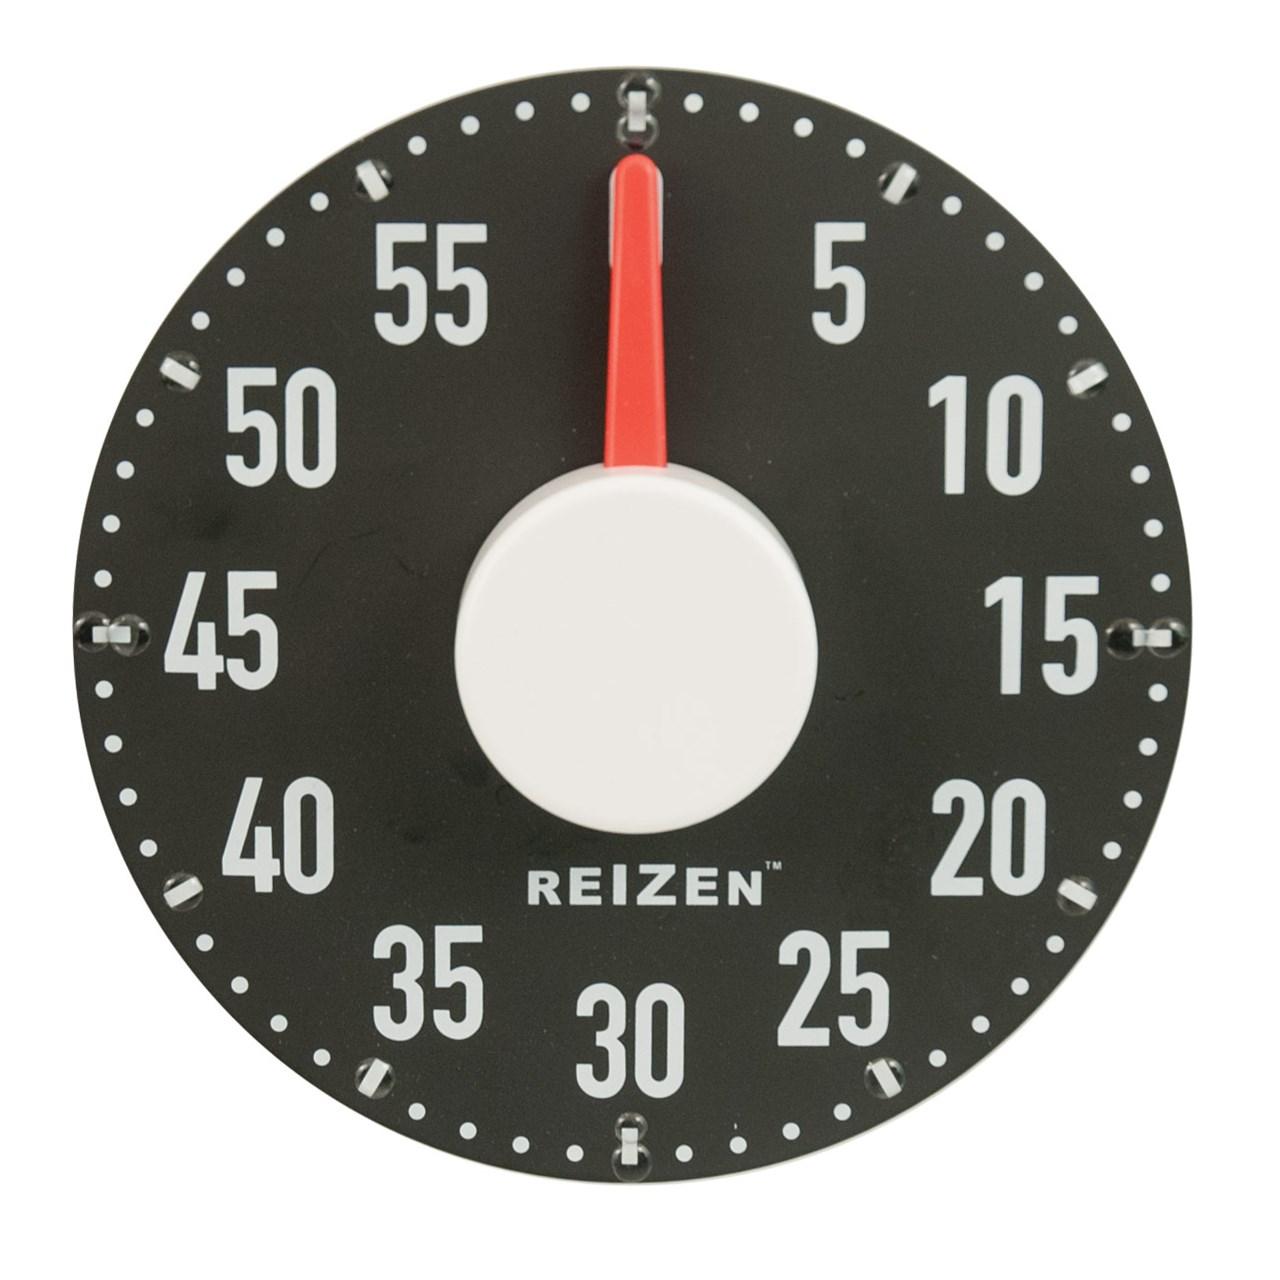 Extra Large Tactile Magnetic Kitchen Timer